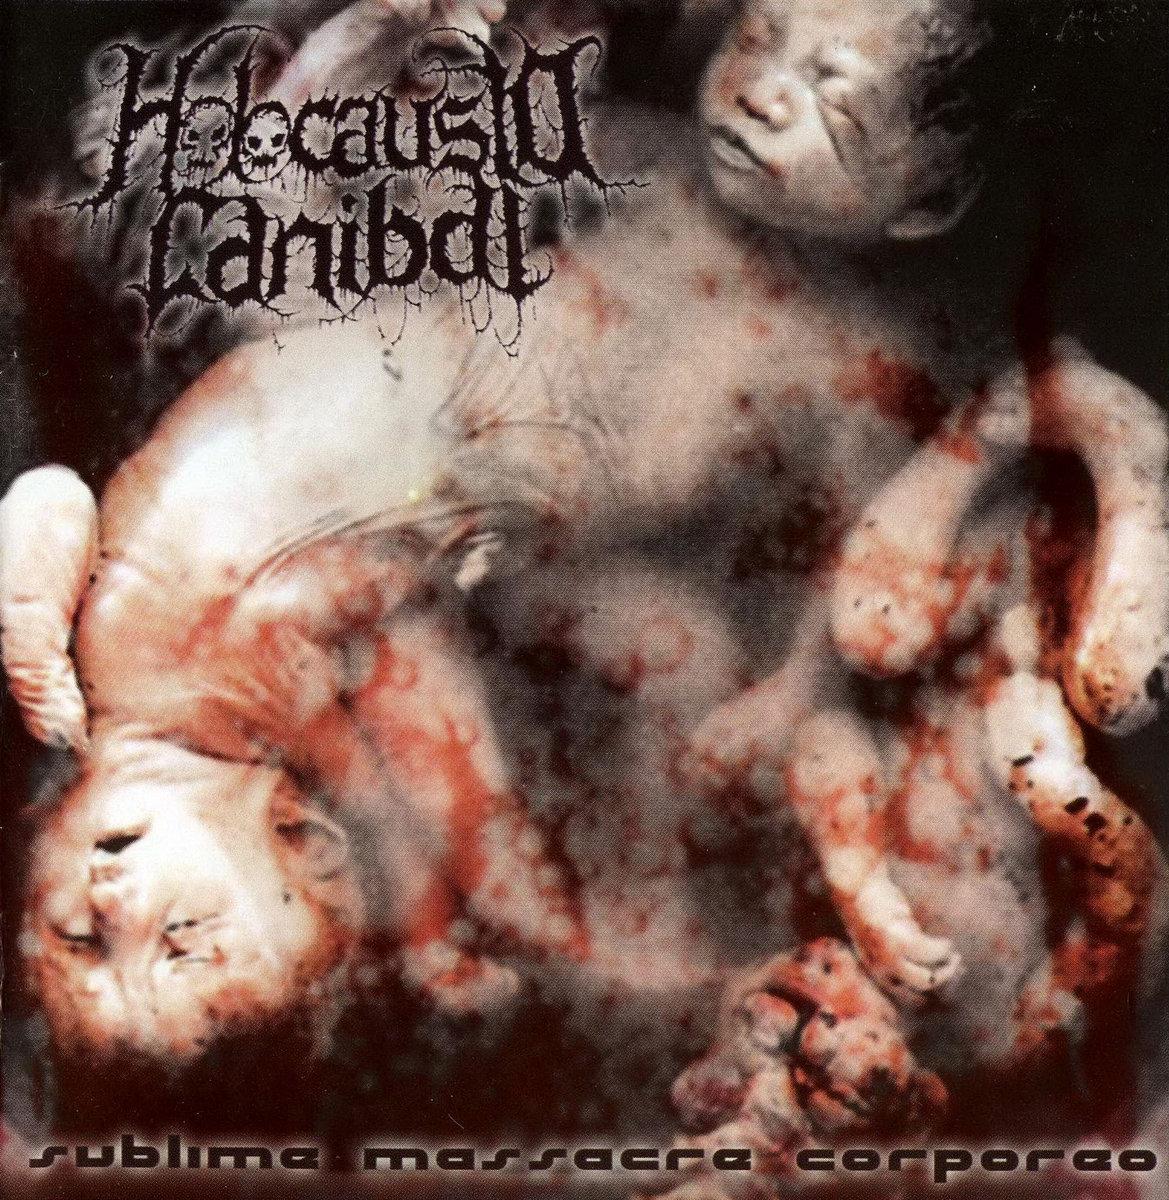 Canibal Porn - Porno Hardgore. from Sublime Massacre Corpóreo by Holocausto Canibal